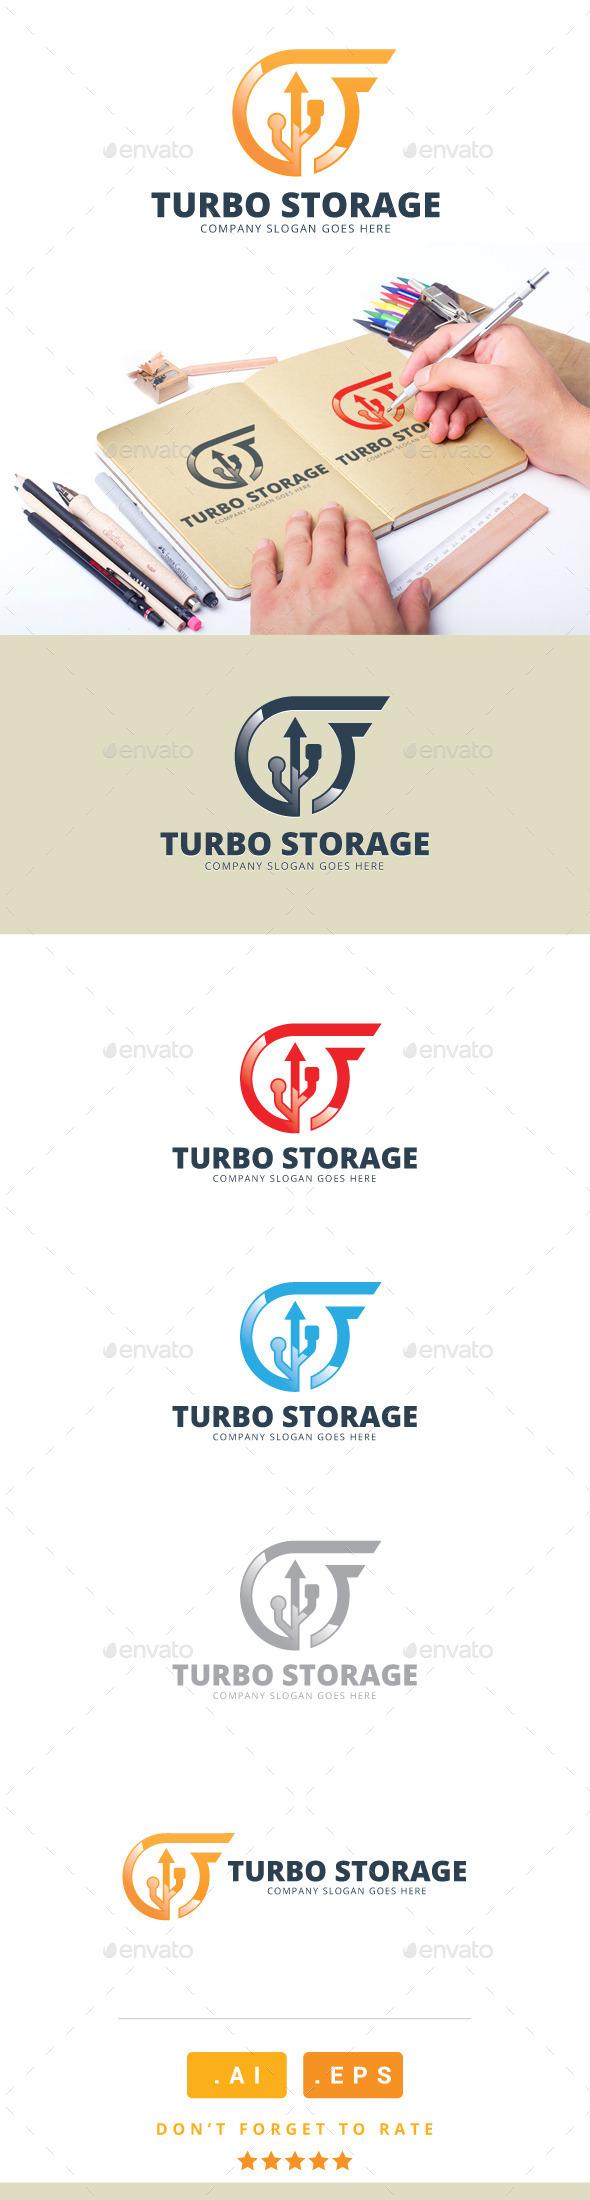 GraphicRiver Turbo Storage Logo 11166043